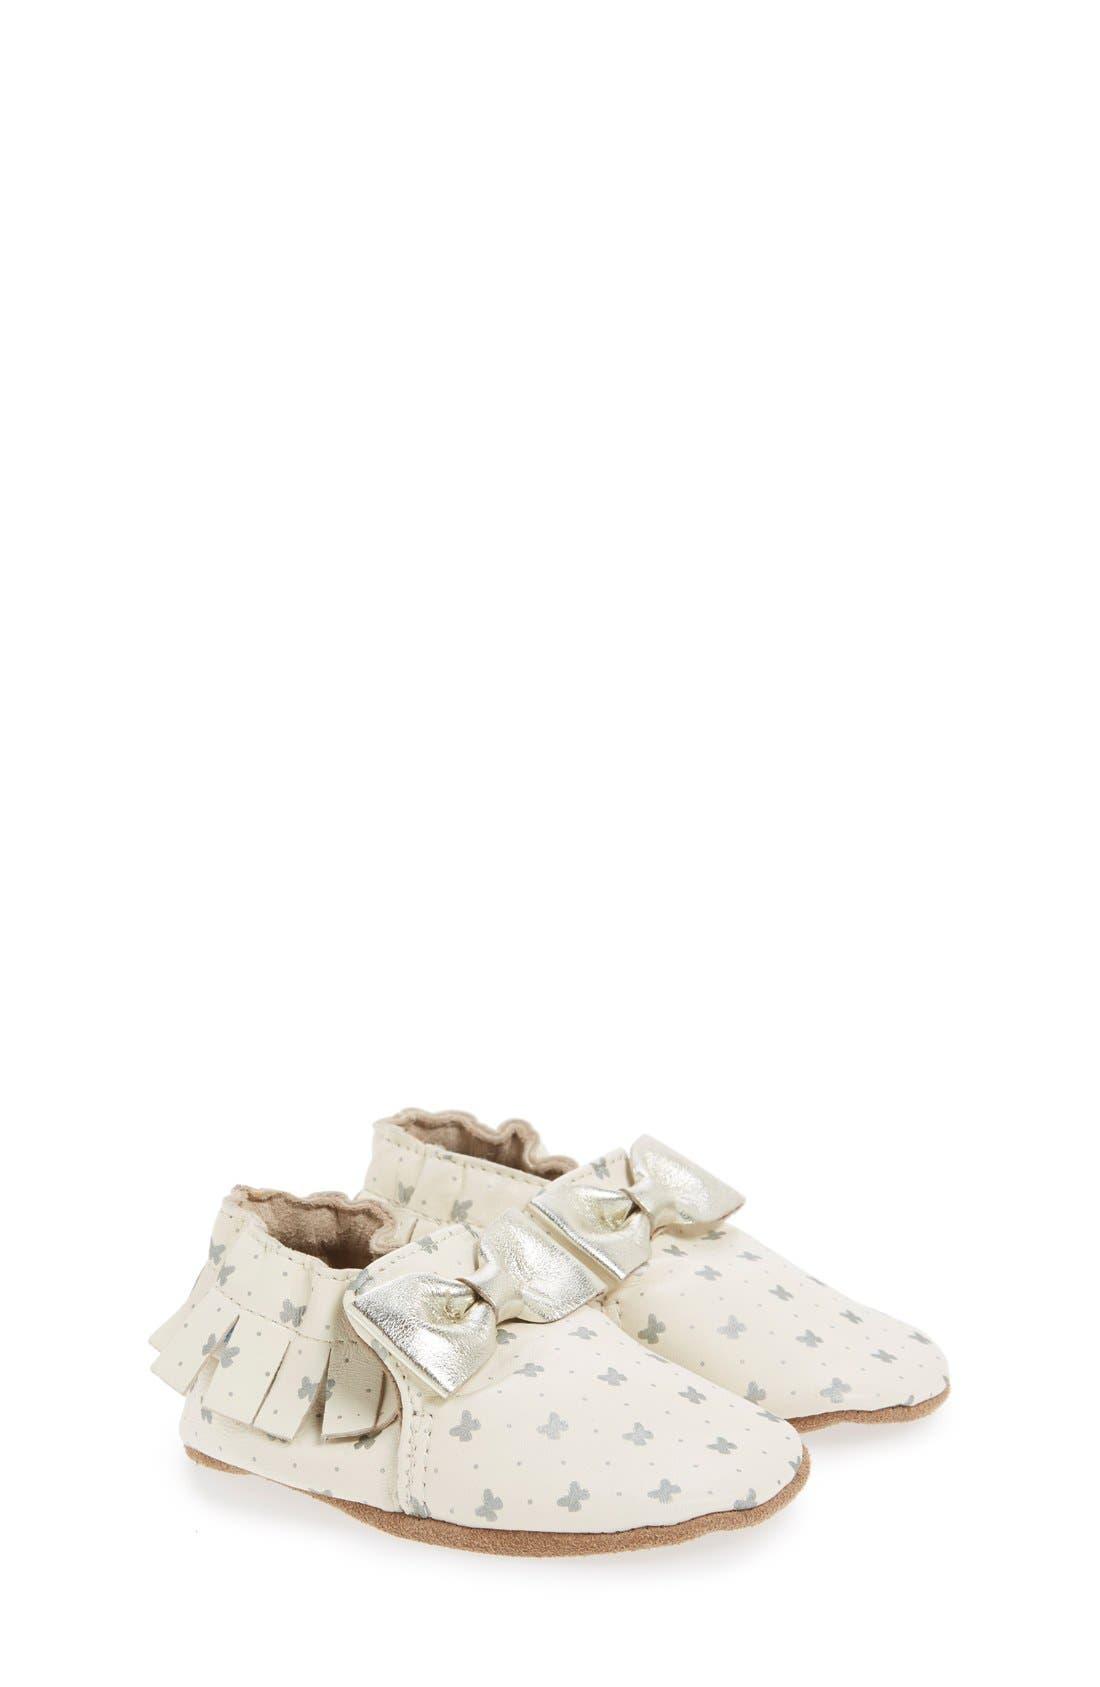 Alternate Image 1 Selected - Robeez® 'Maggie Moccasin' Crib Shoe (Baby & Walker)